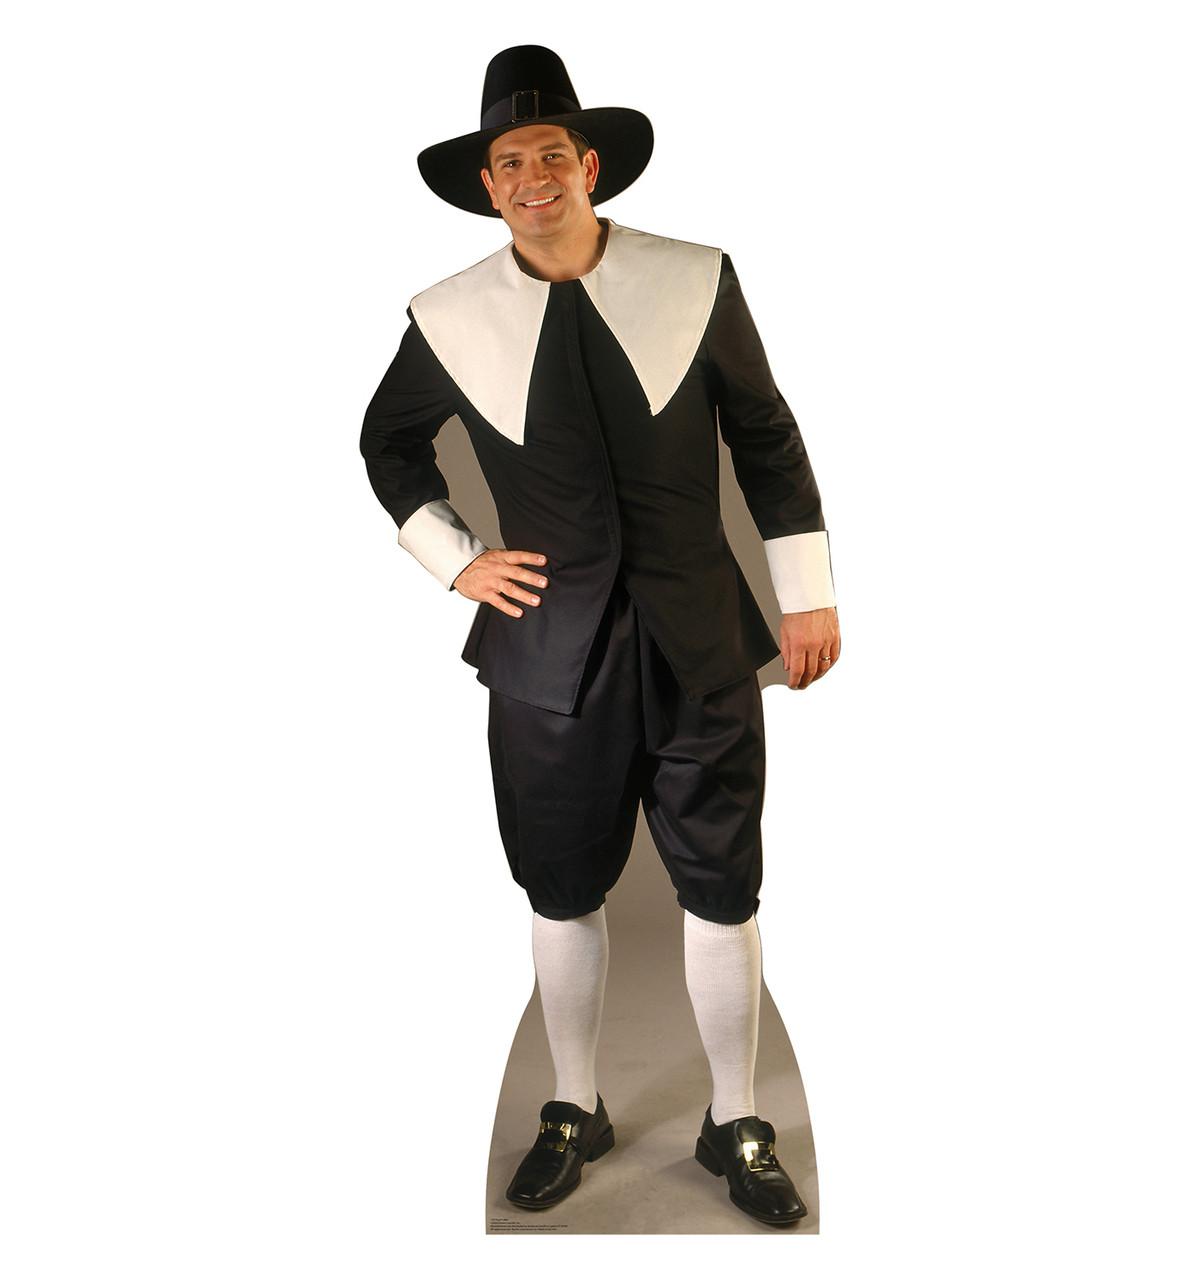 Life-size Pilgrim Man Cardboard Standup